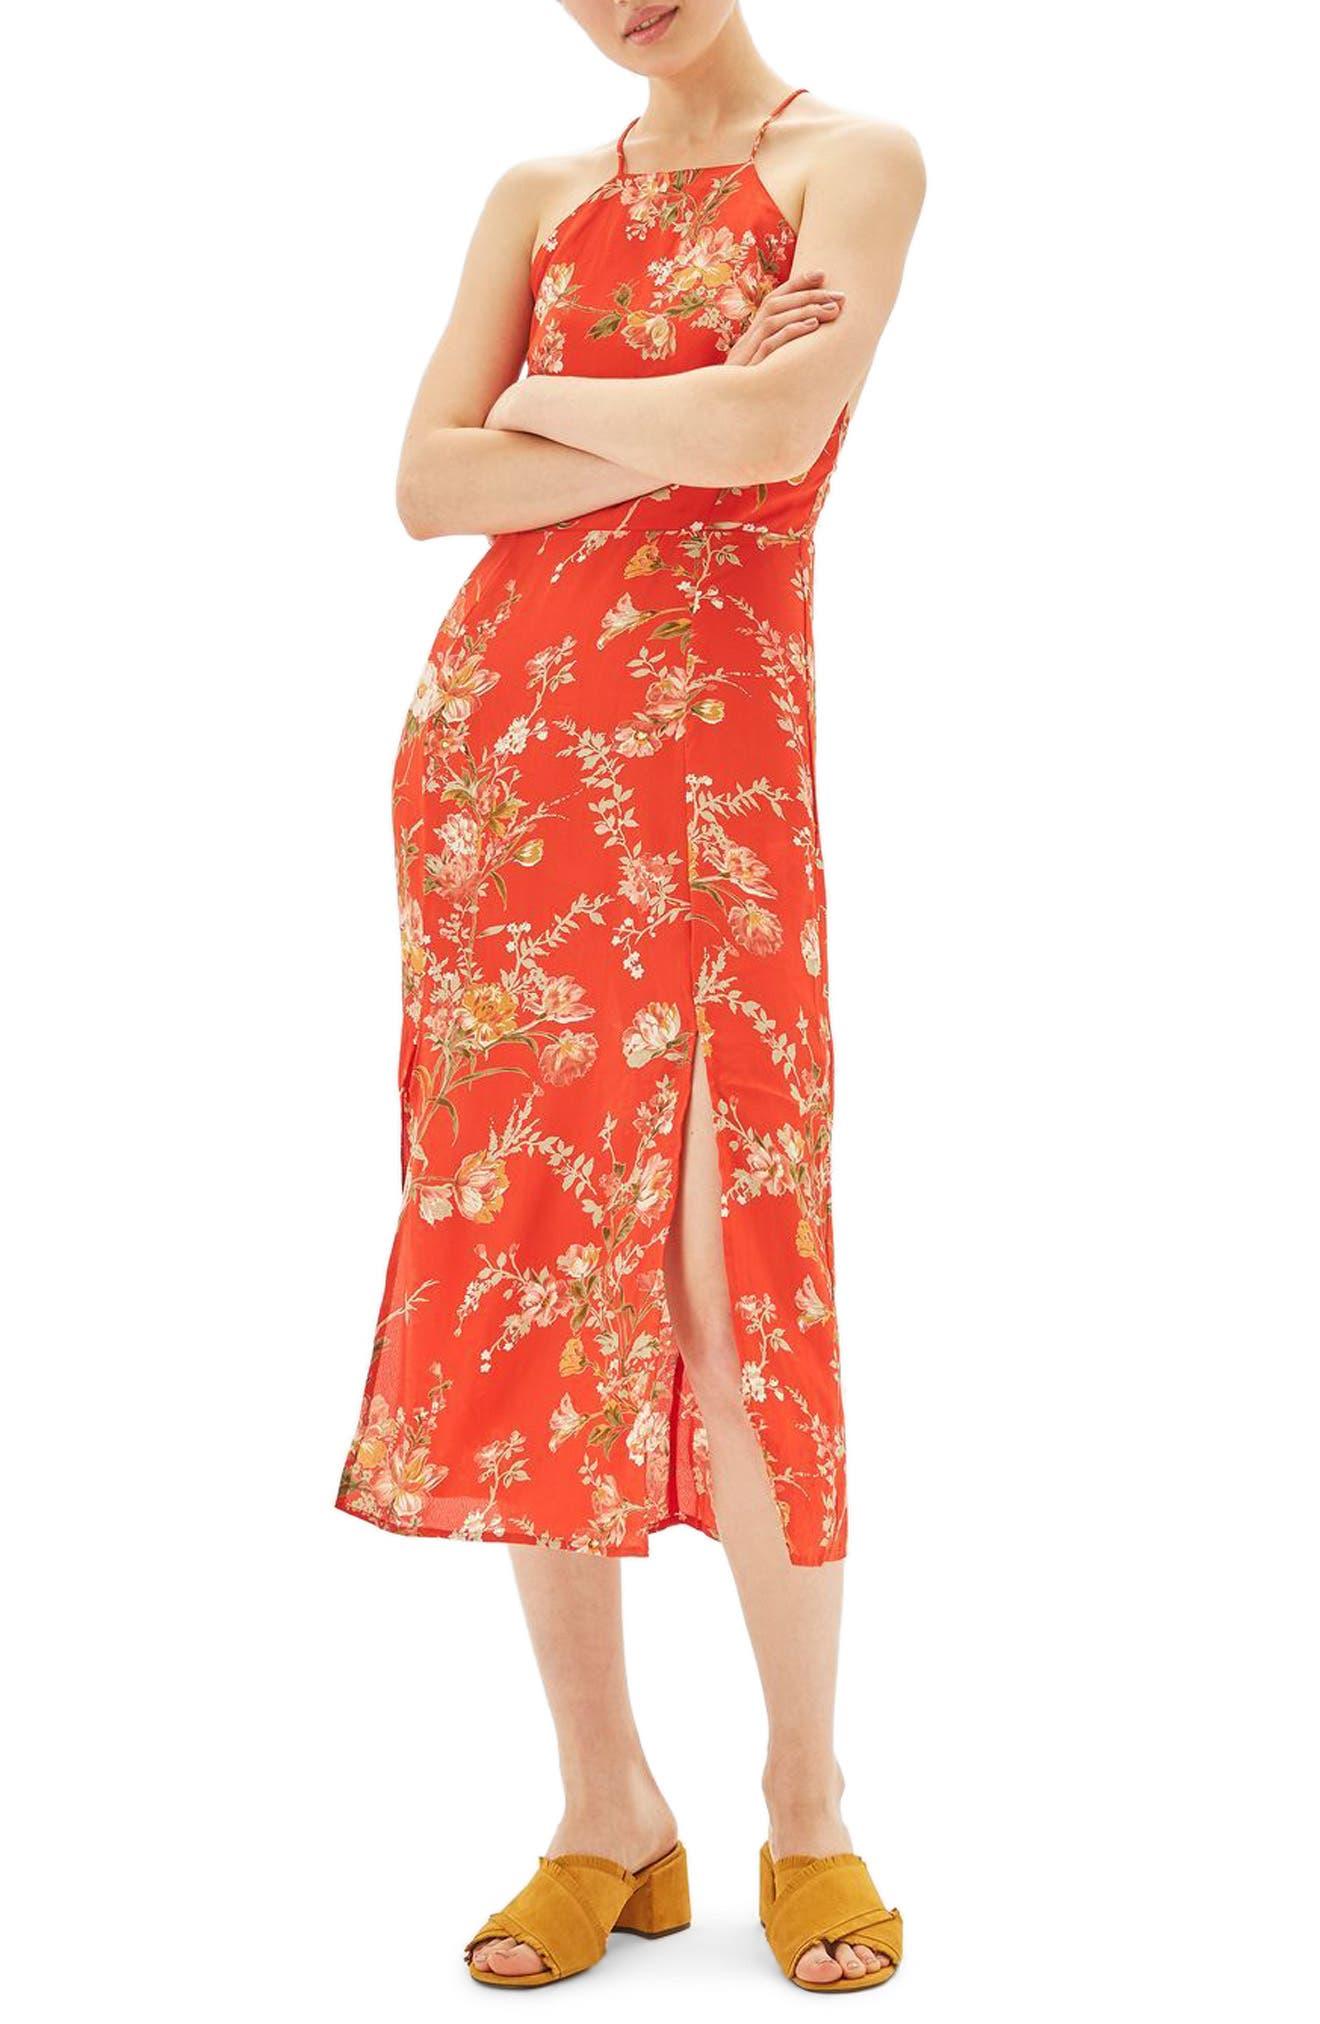 Topshop Eastern Floral Midi Dress